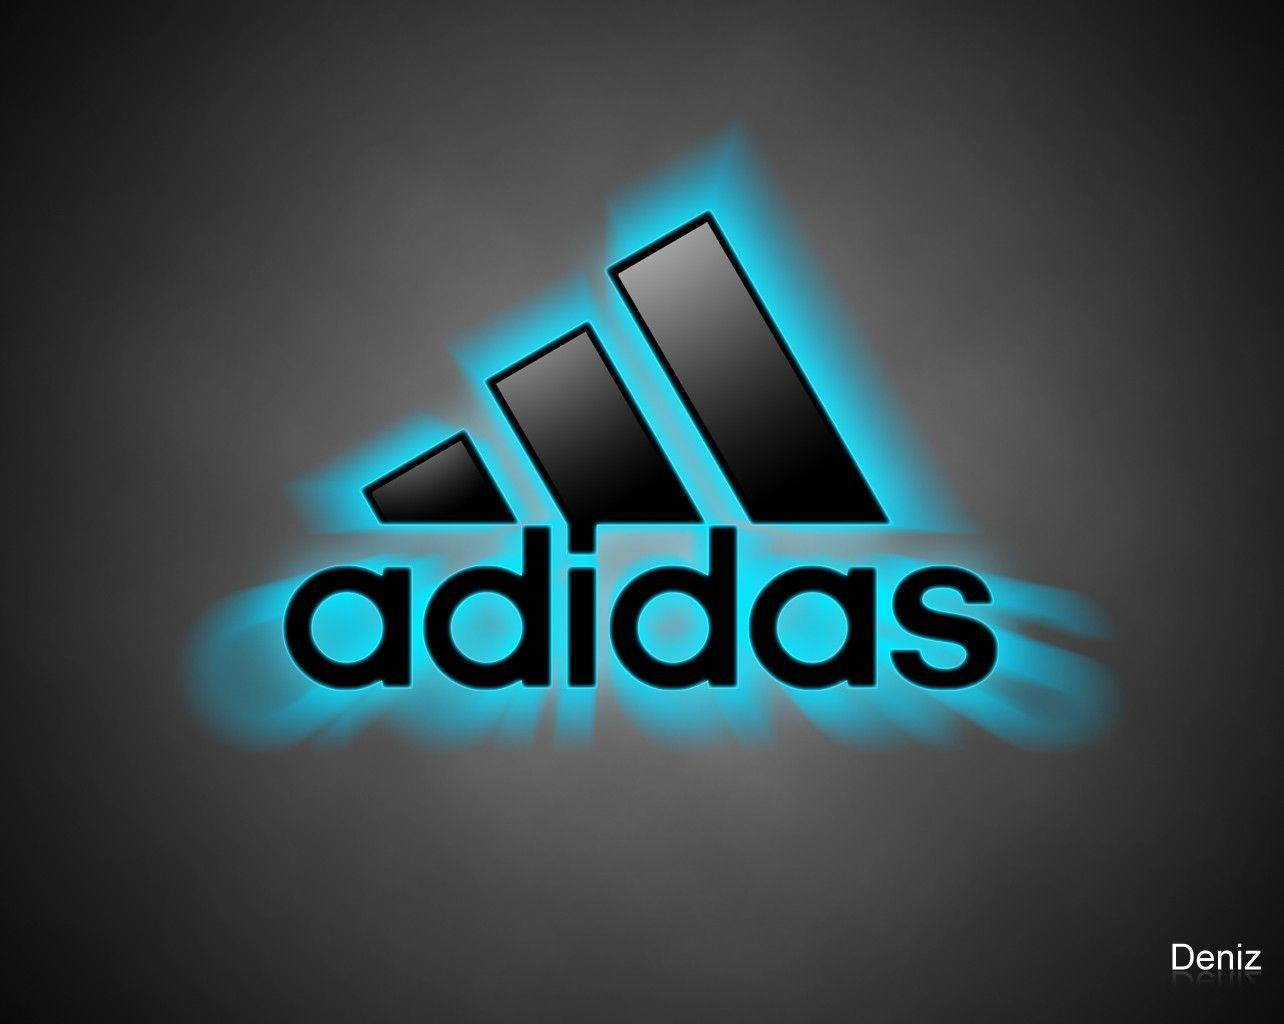 Adidas 4k Wallpapers Wallpaper Cave